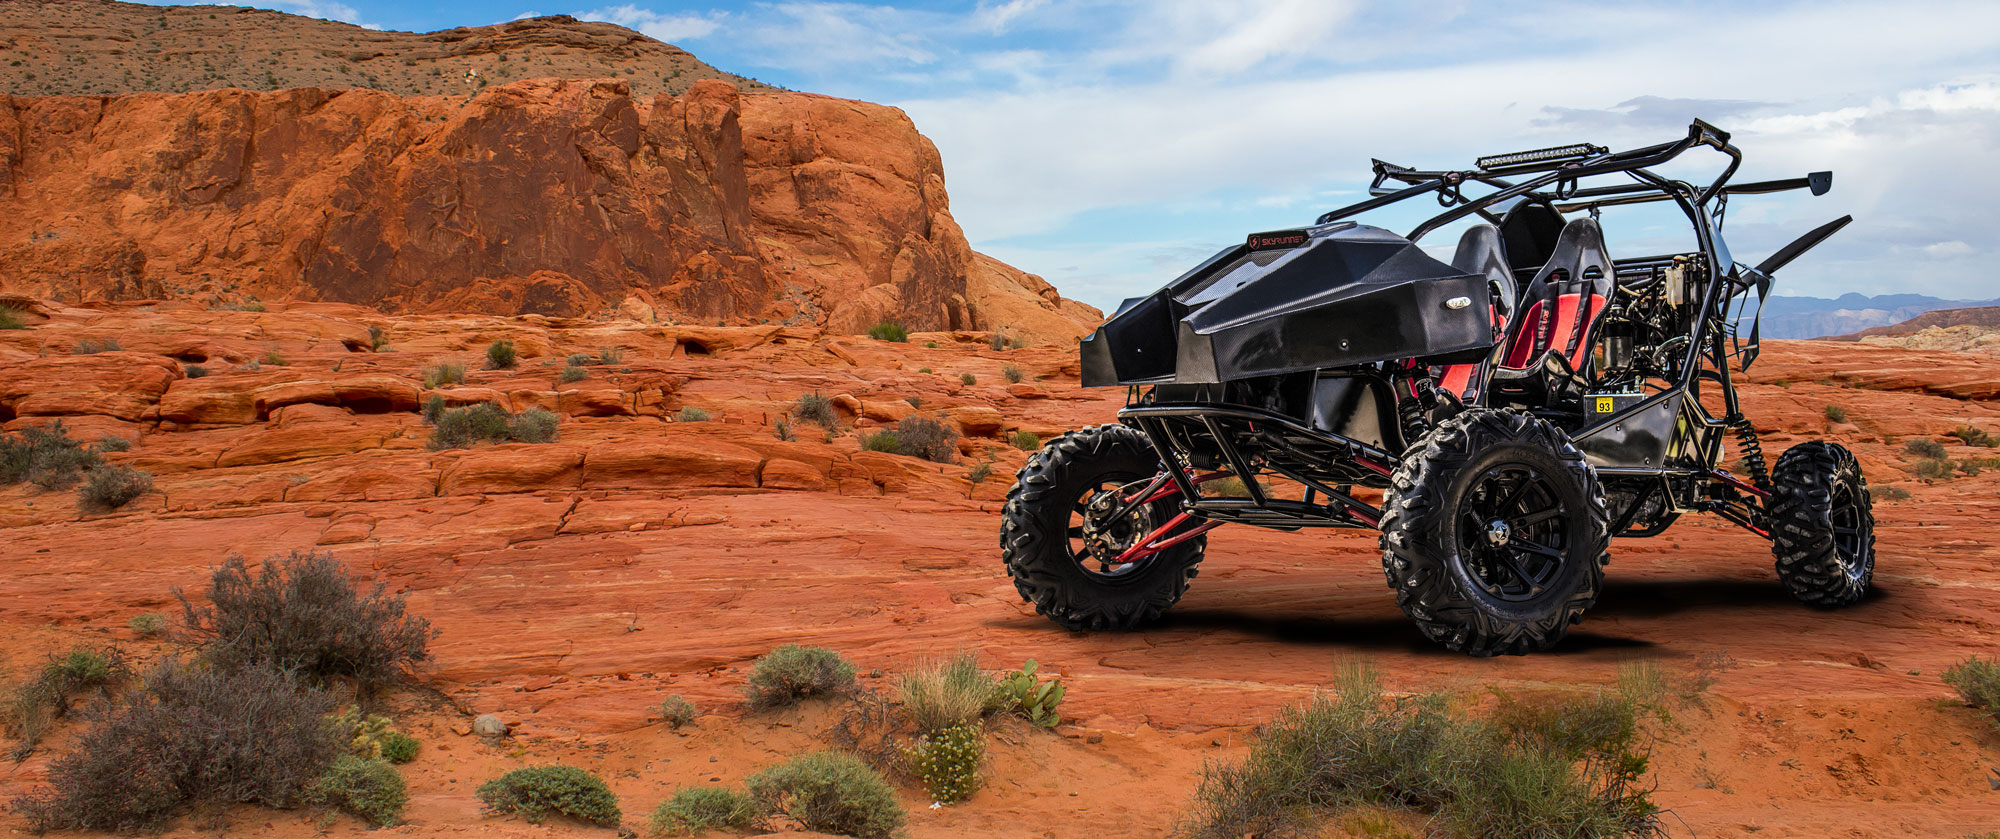 Skyrunner off-road flying buggy